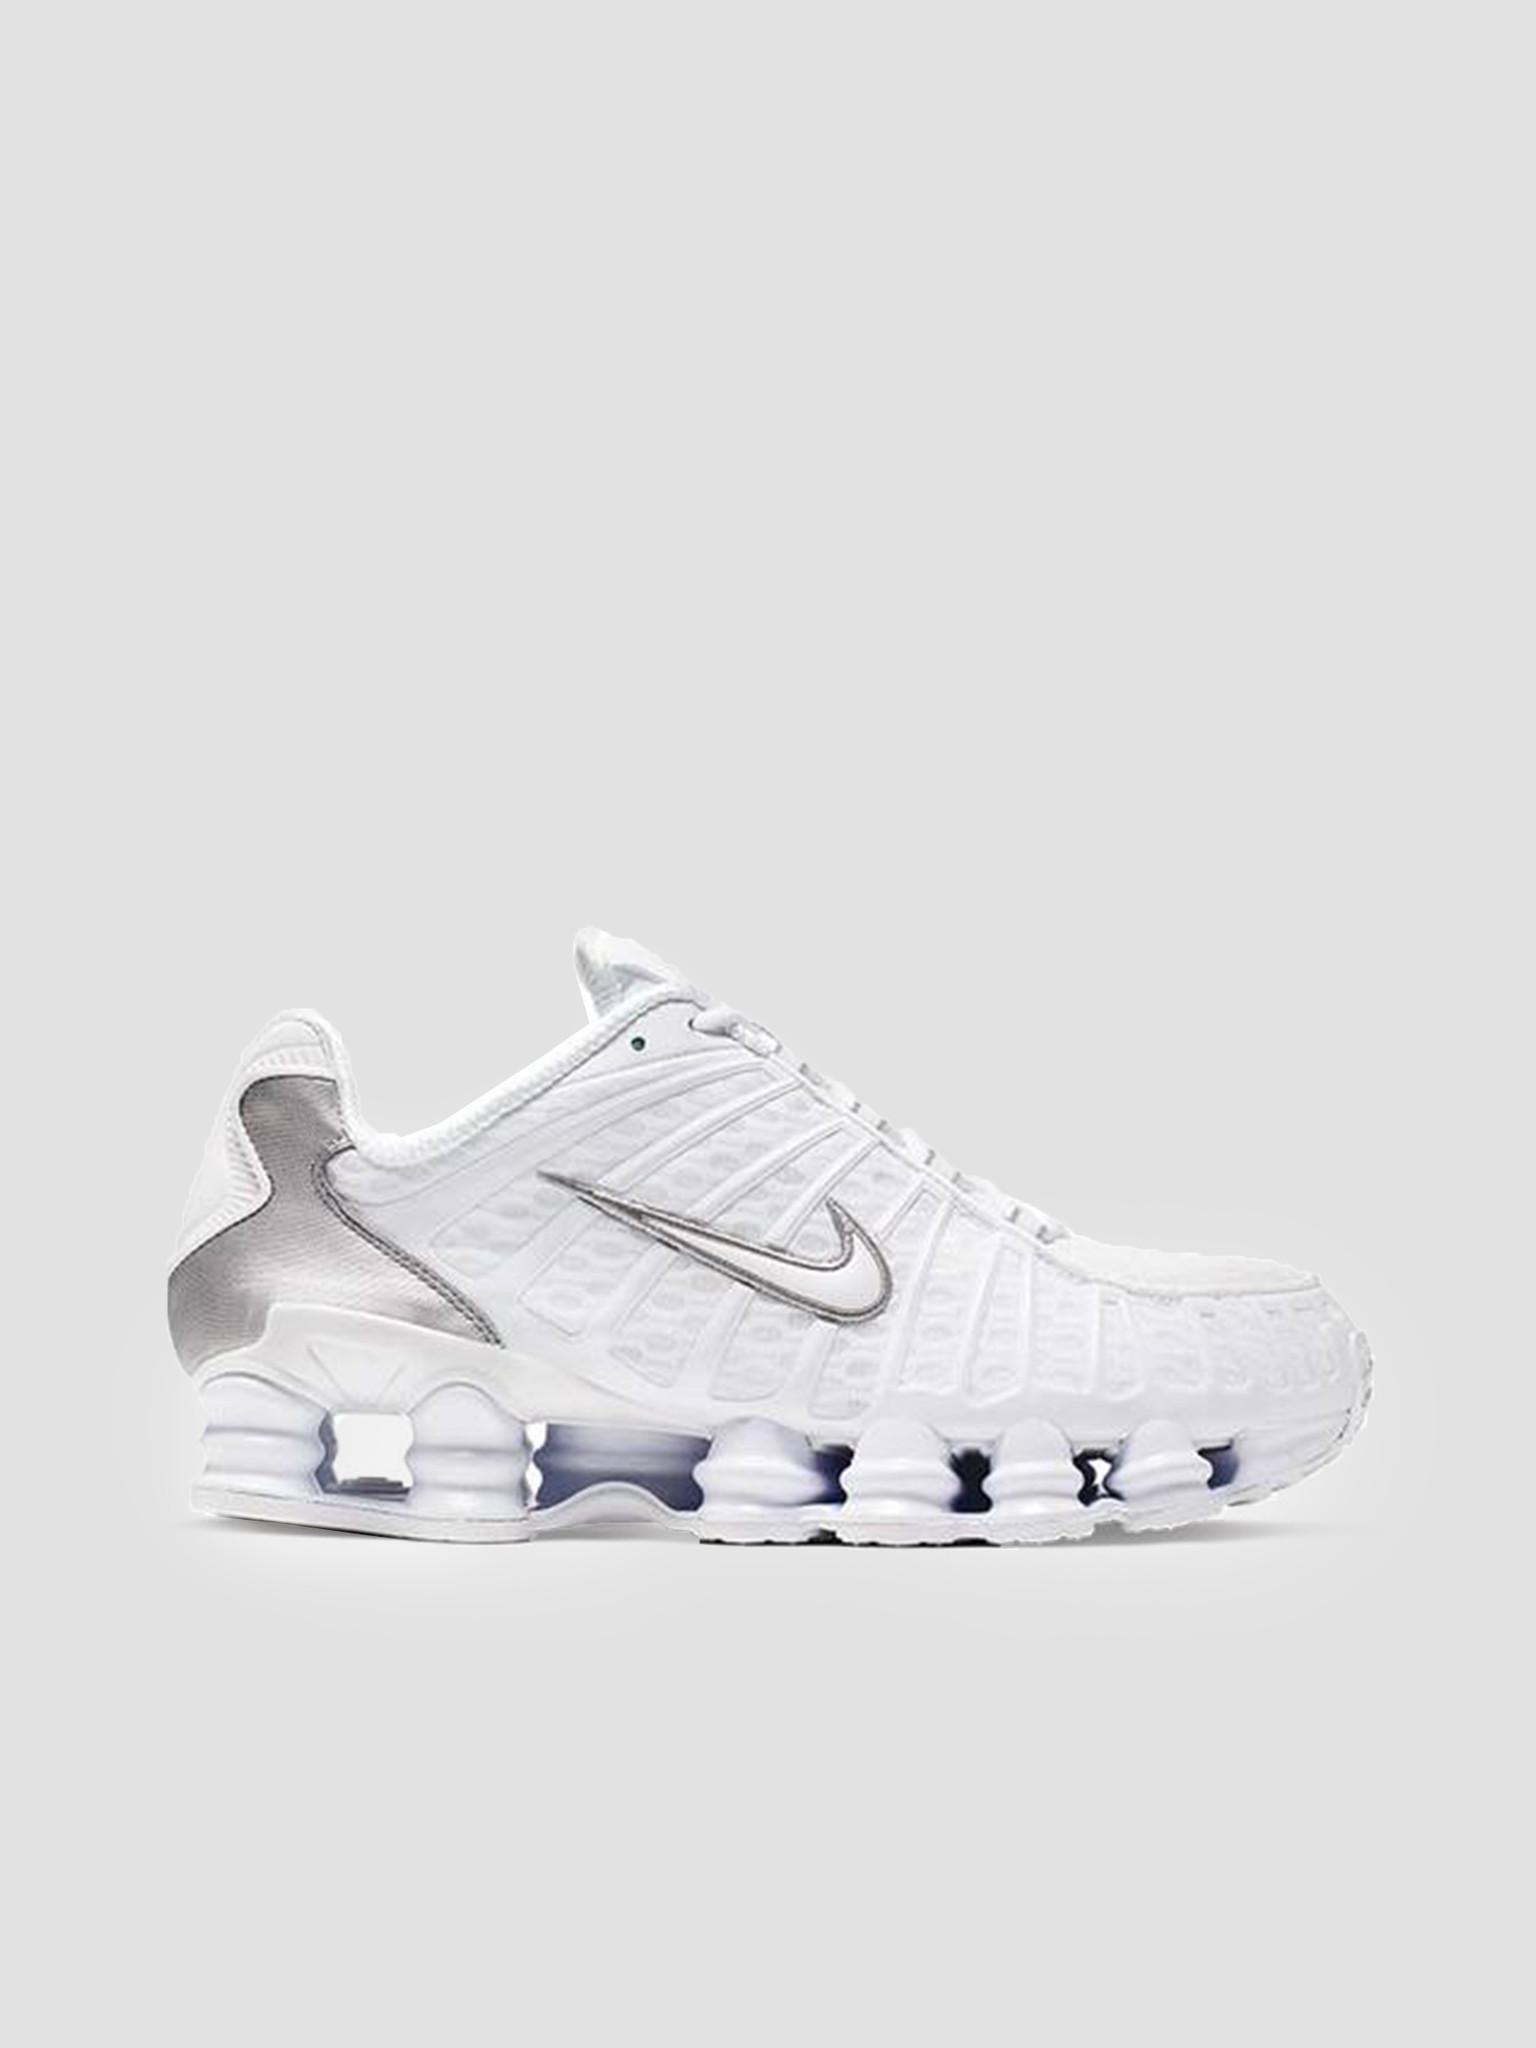 Nike Nike Shox Tl White White Metallic Silver Max Orange AV3595-100